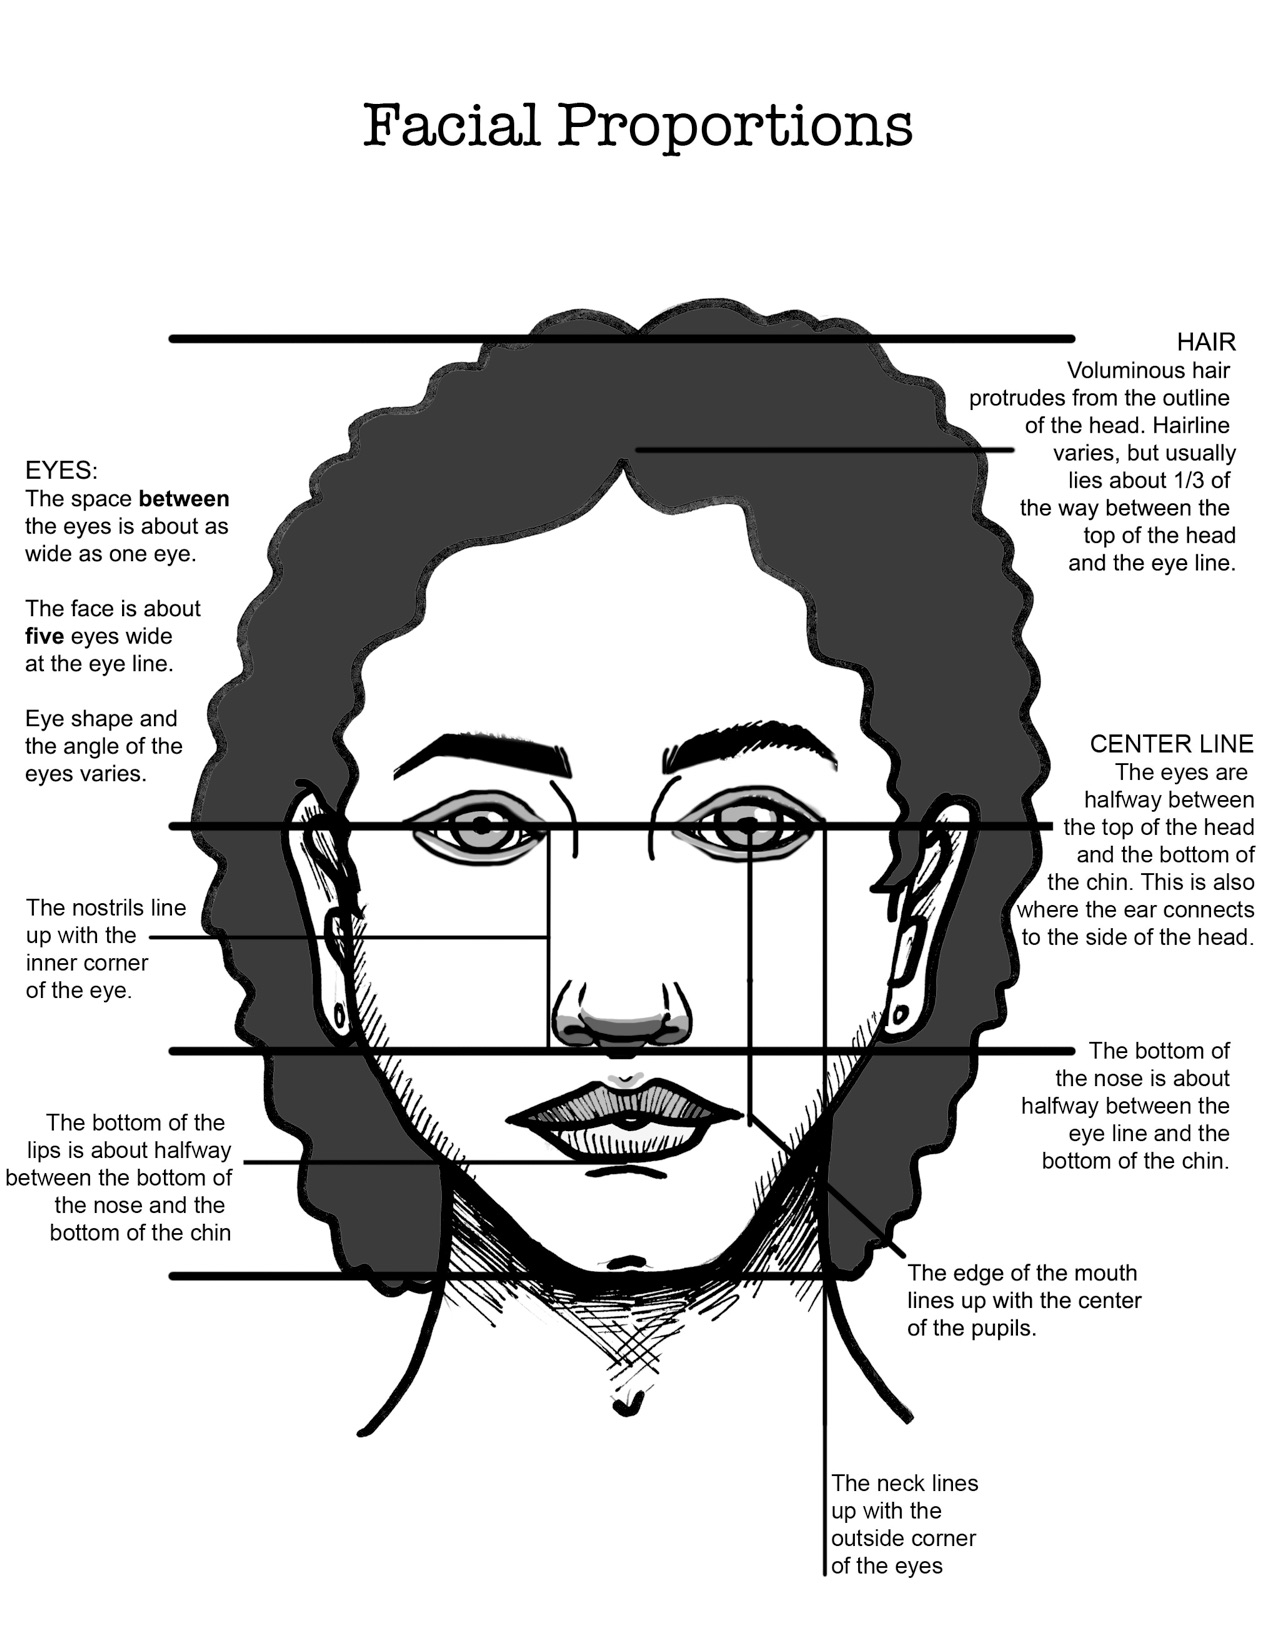 Facial Proportions3.jpg